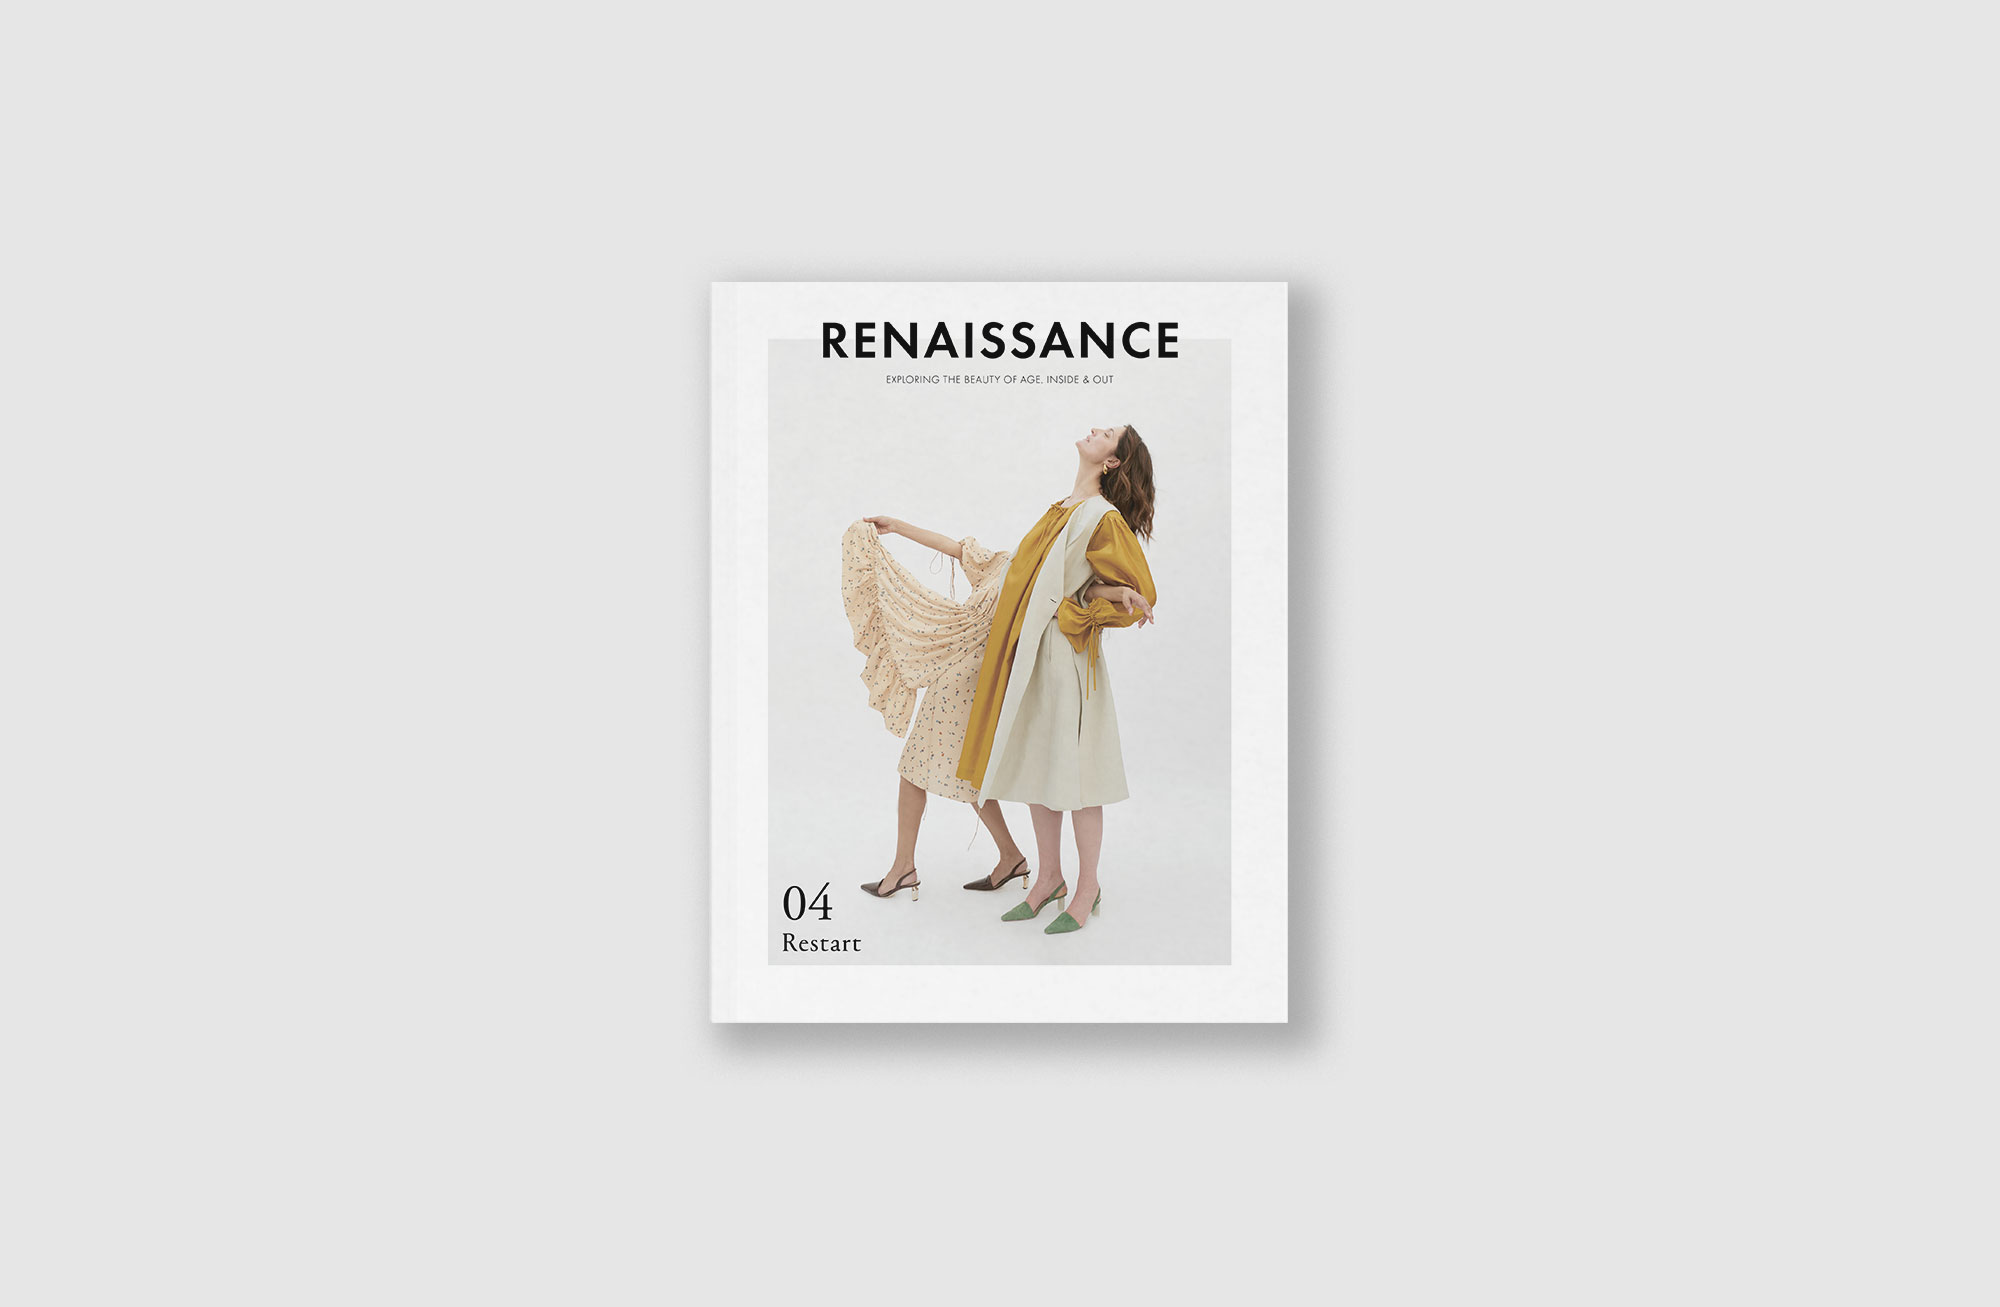 renaissance-03-3.jpg